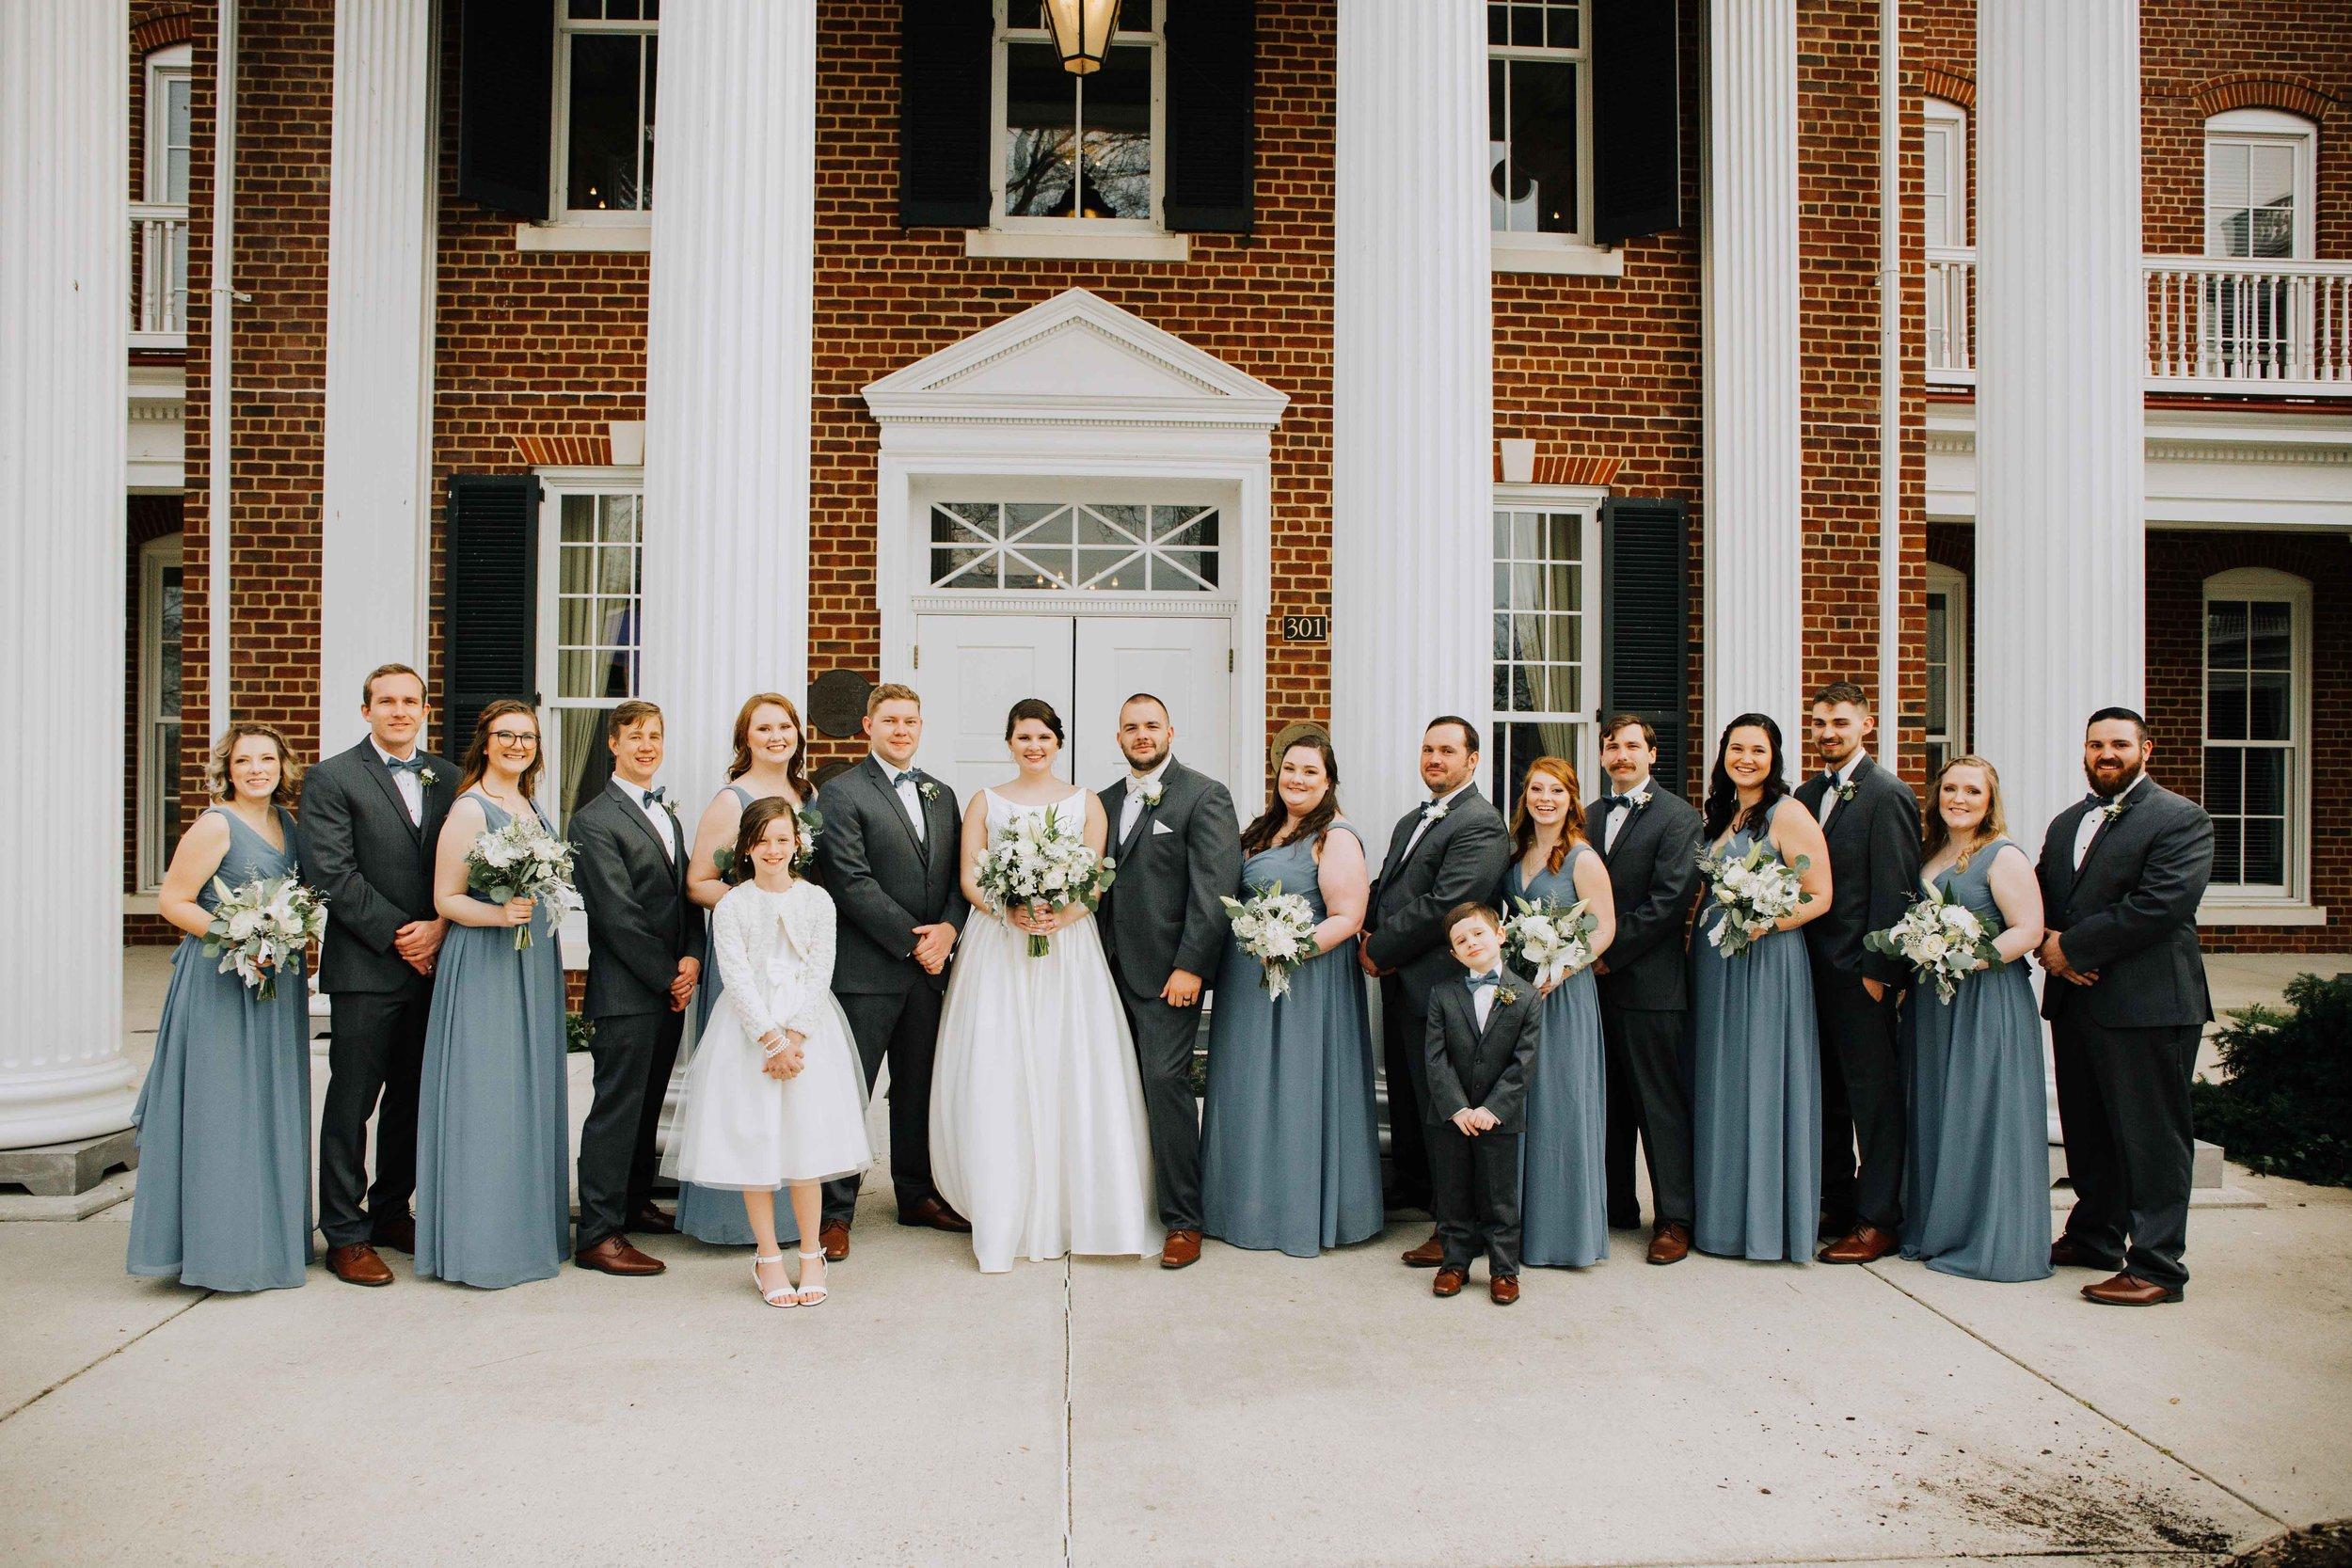 Farmville-Virginia-Wedding-Hotel-Weynoke-Downtown-Jacqueline-Waters-Photography-Detailed- (1076).jpg